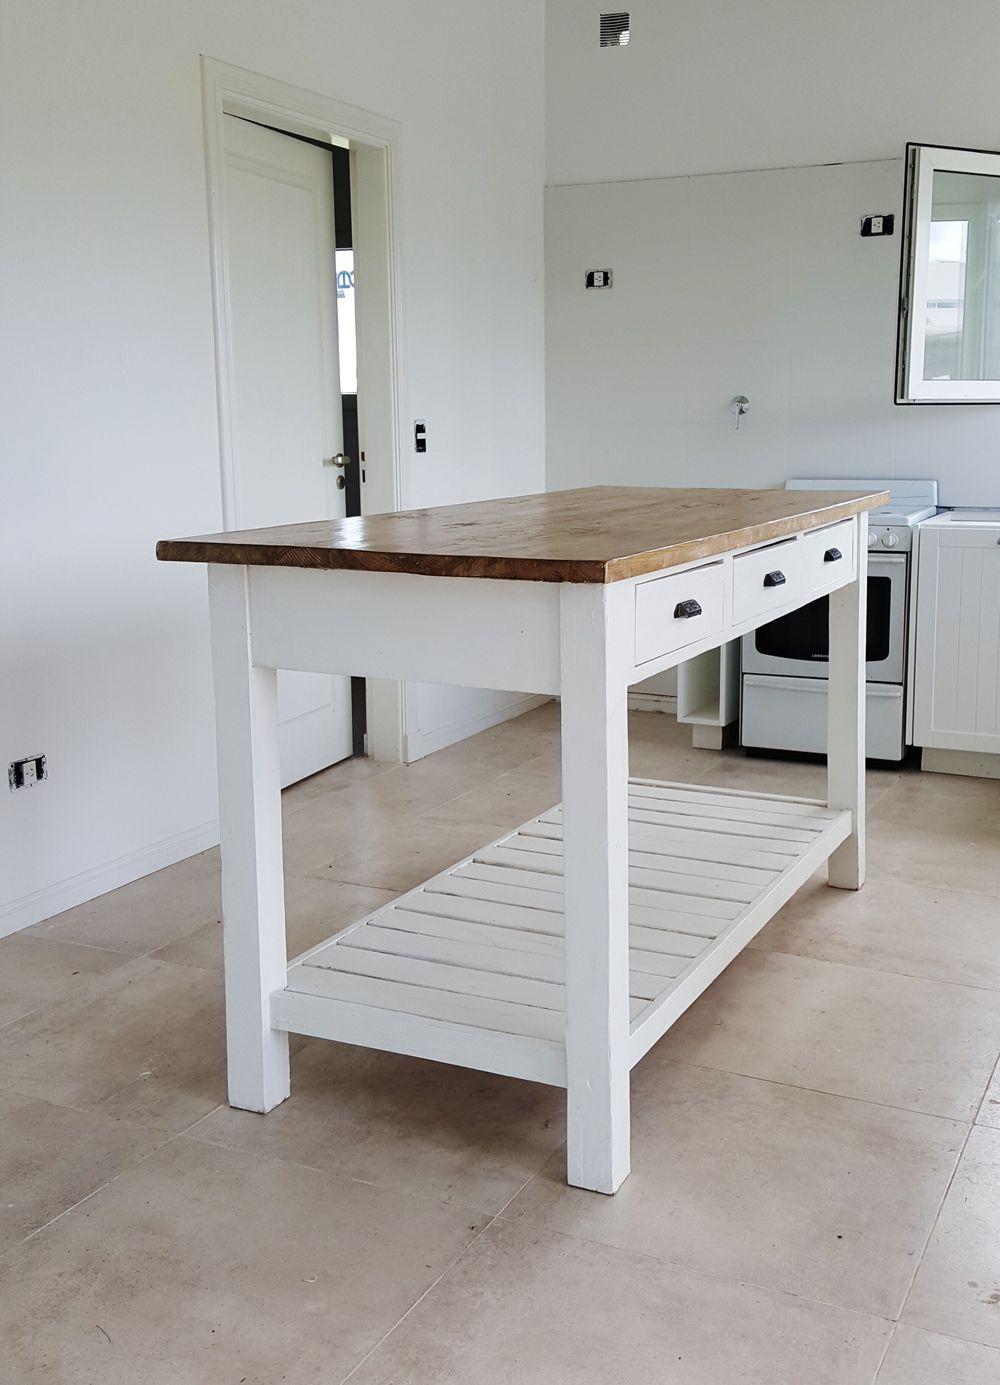 DECO extra table kitchen   whites   Cocinas rusticas   Pinterest ...